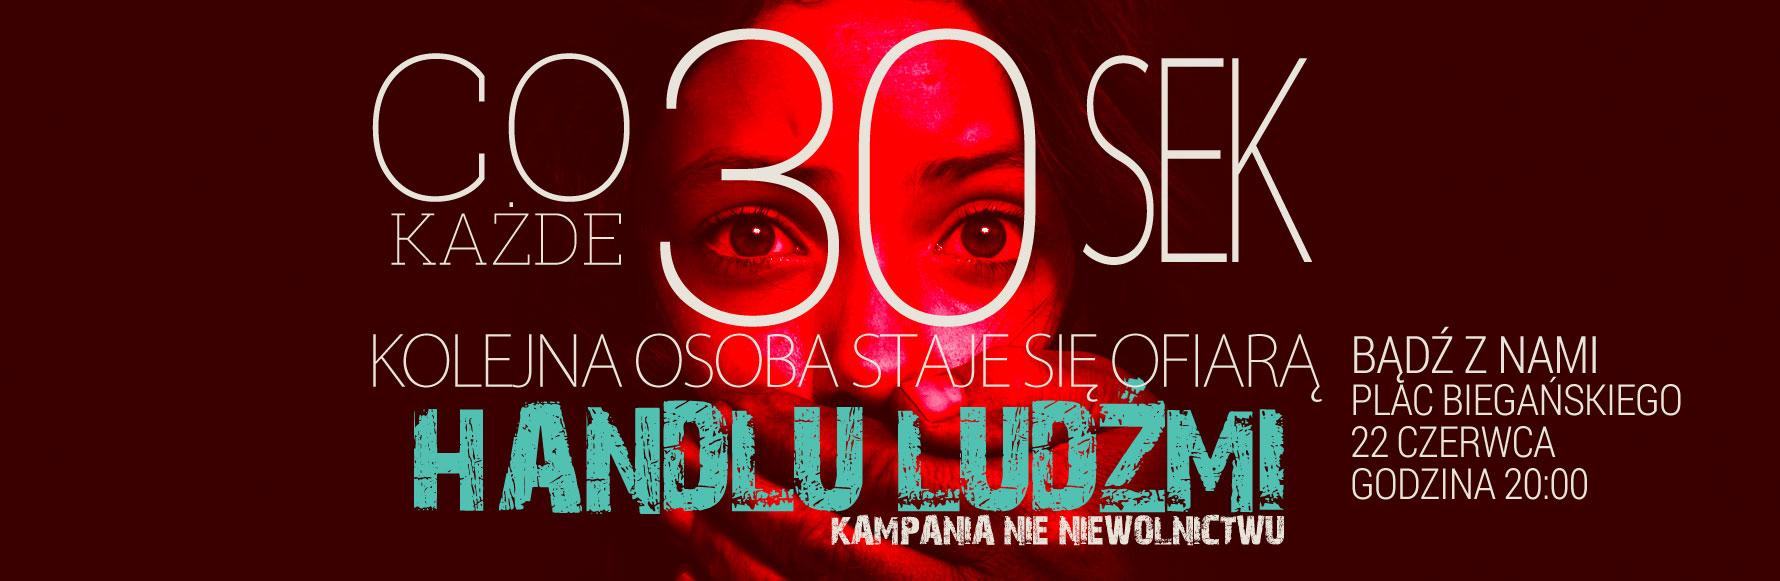 No Longer Music - Kampania Nie Niewolnictwu